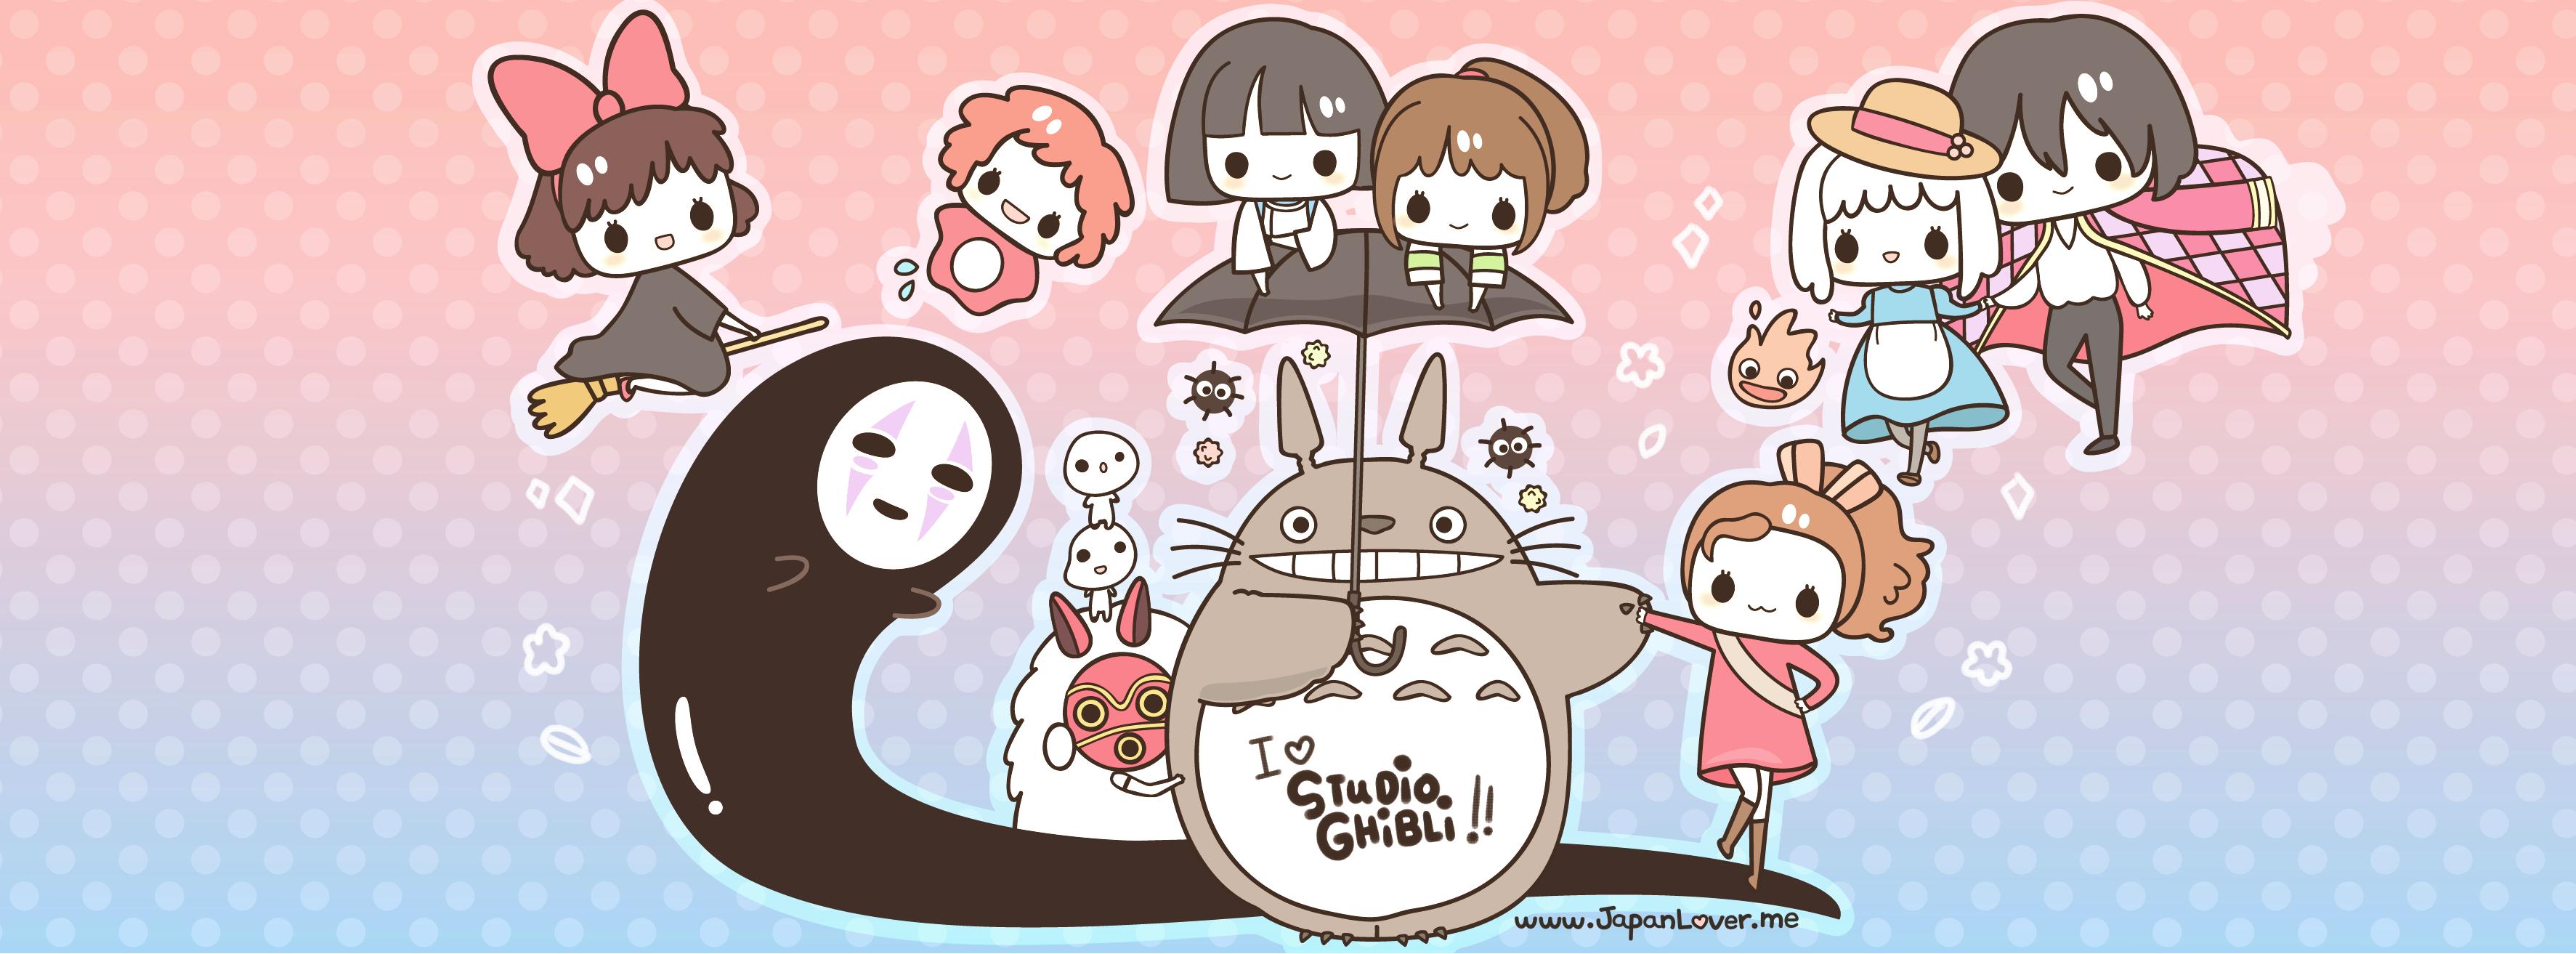 Hayao miyazaki clipart banner Facebook Cover Art Ghiblimonth cover cool website | โทโทโร่ | Kawaii ... banner